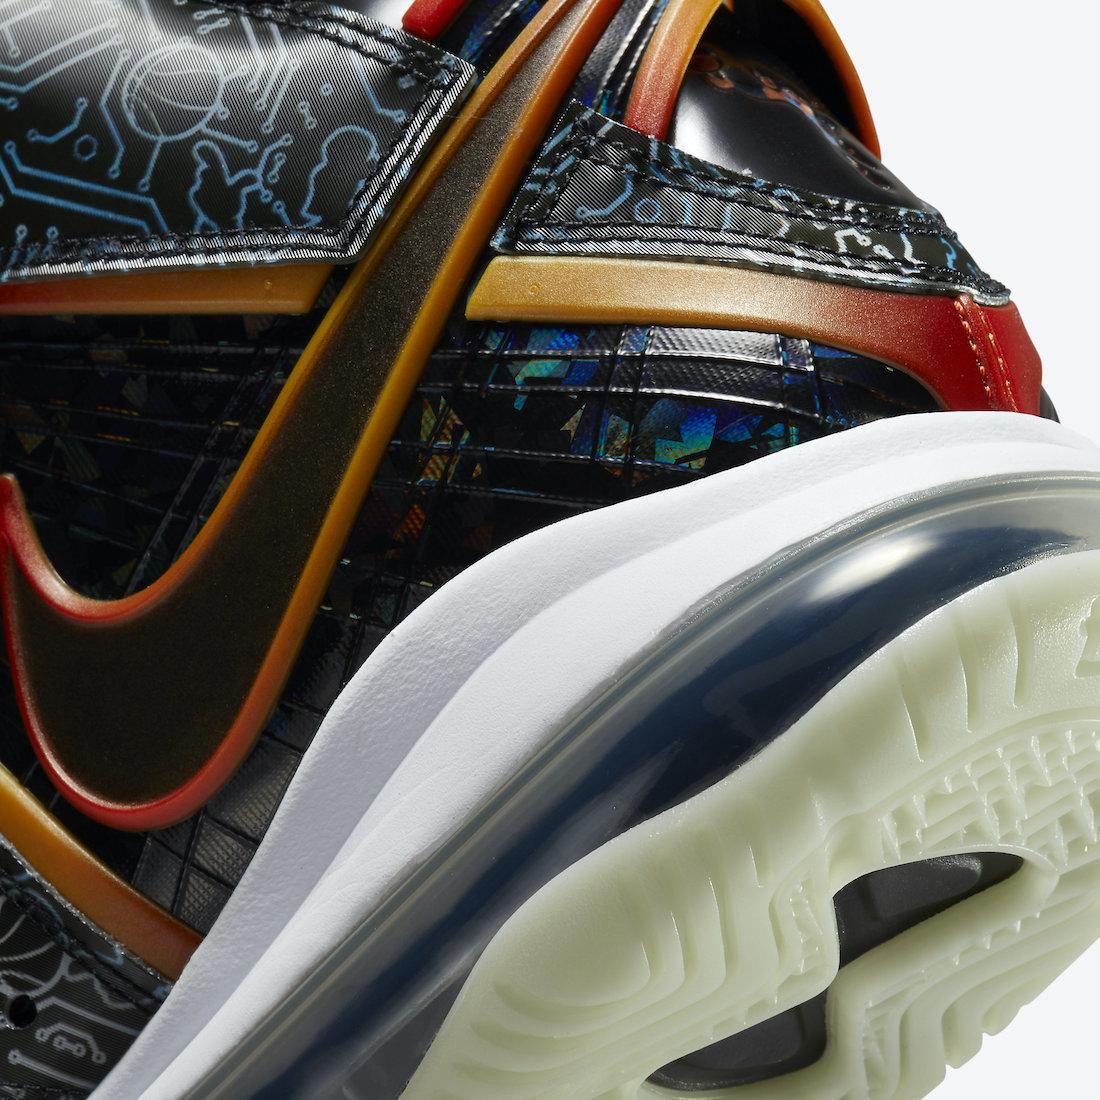 Nike-LeBron-8-Space-Jam-DB1732-001-Release-Date-7-1